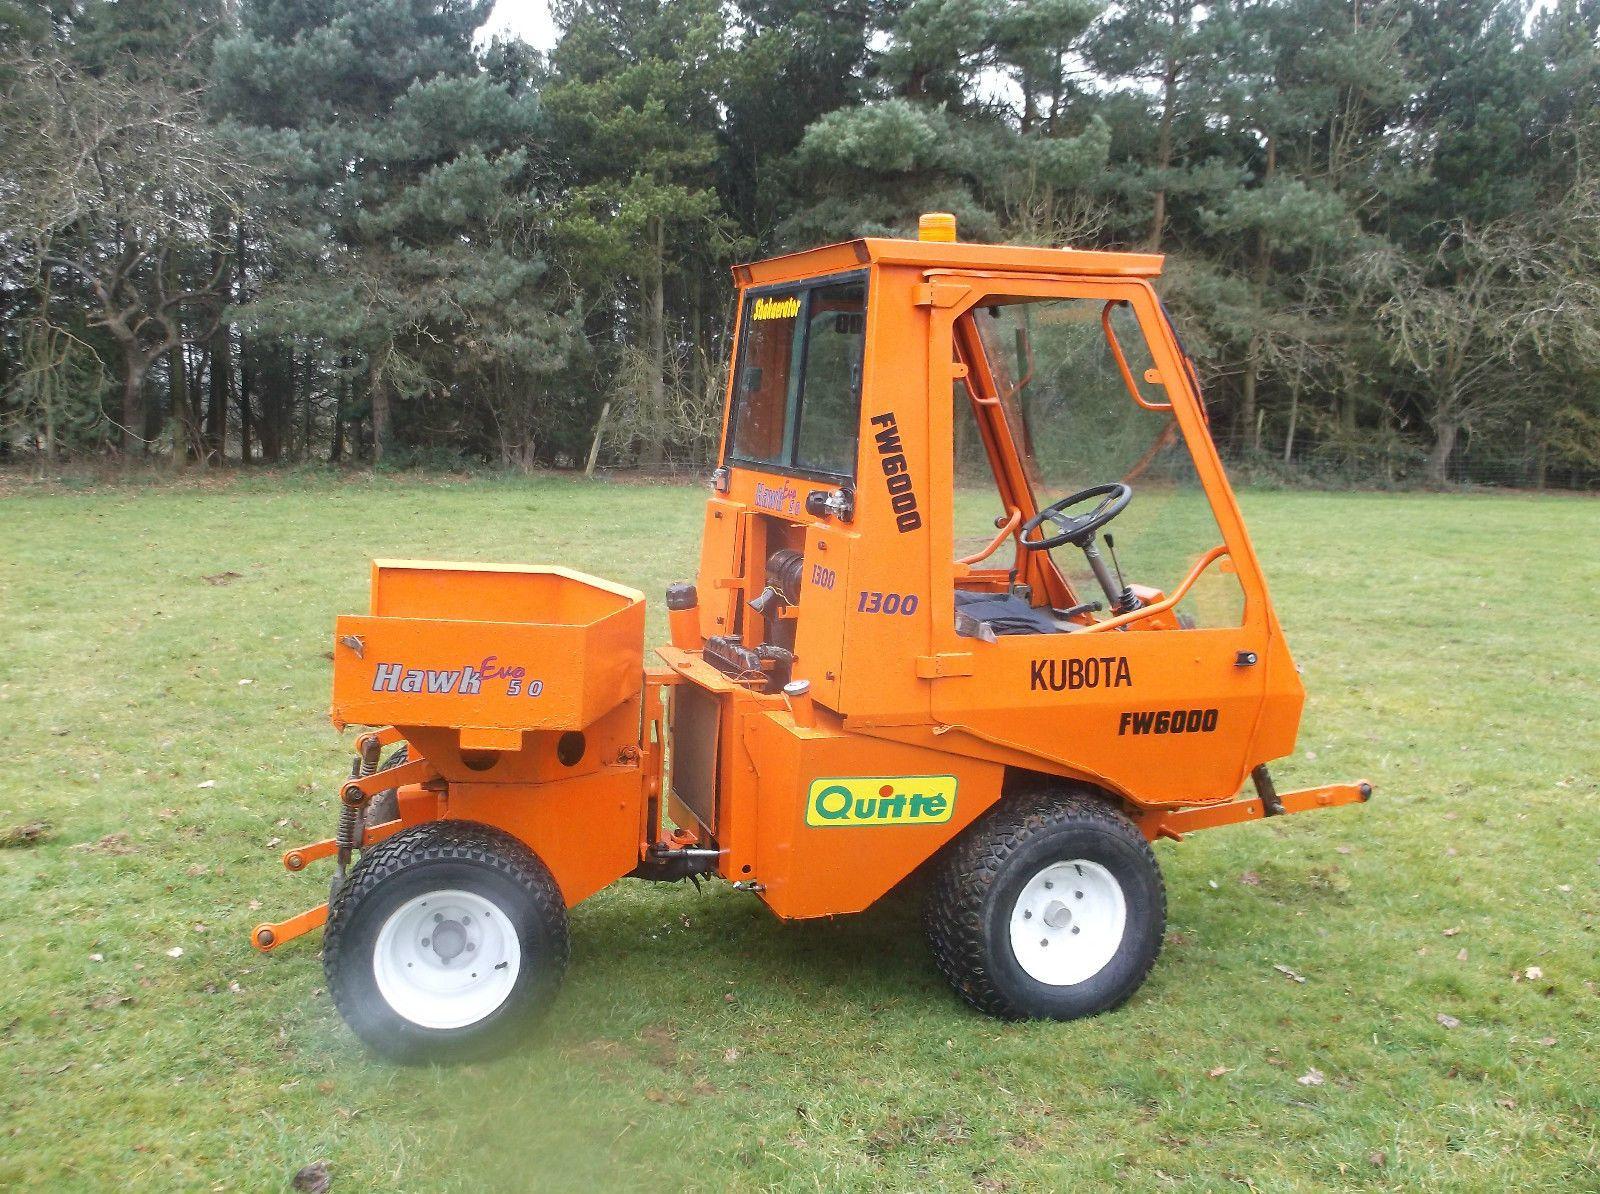 Kubota Mini Tractor Compact Like Quad Bike 4wd Diesel Motor